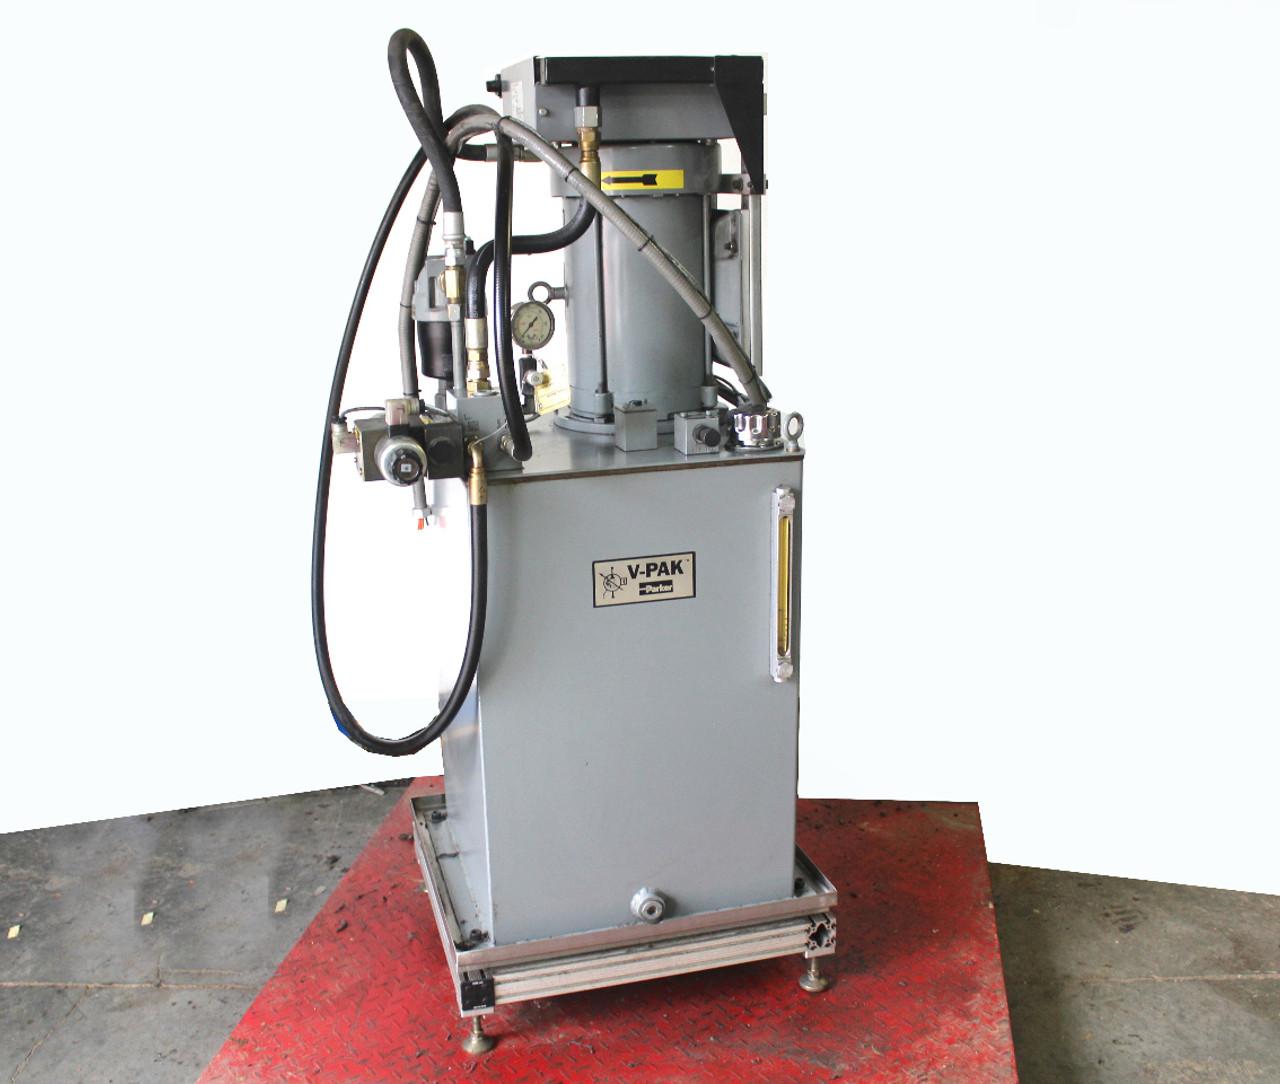 Parker V-Pak 10Hp Hydraulic Pump 15 GPM 1090 PSI 40 Gal Reservoir V415NS5PNR1